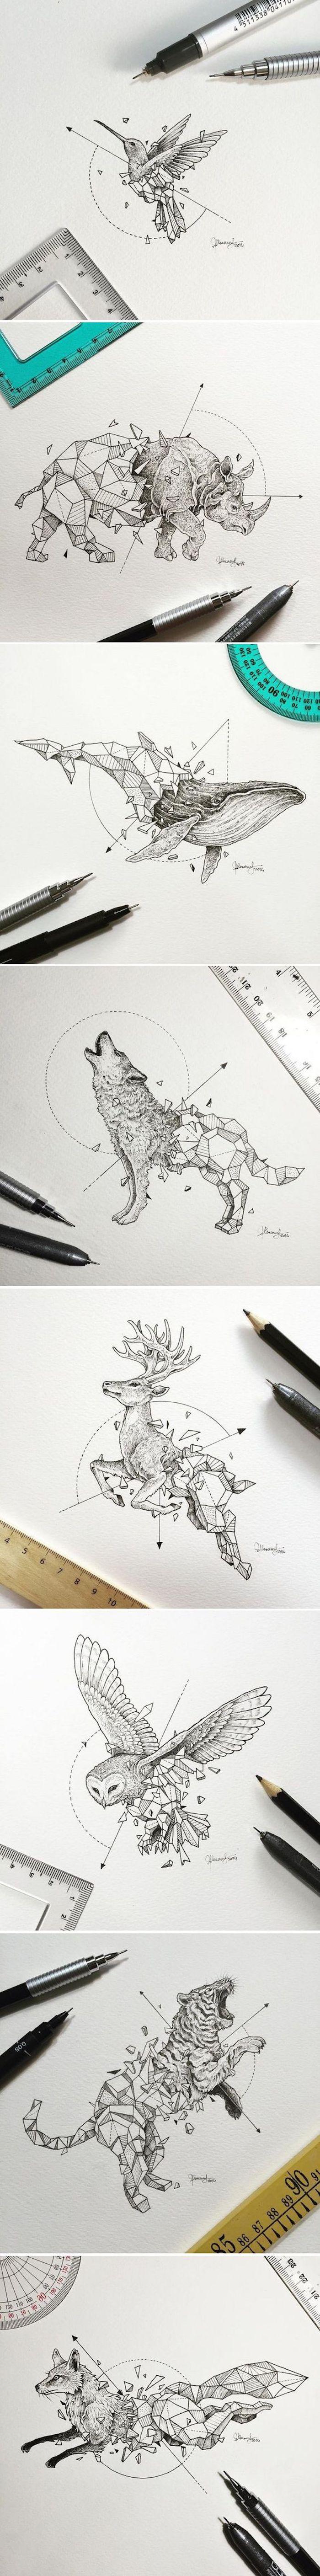 Tattoo Ideen, Tier-Tattoo, Kolibri, Wolf, Eule, Fuchs, Wal, Einhorn, Tiger, Hirsch